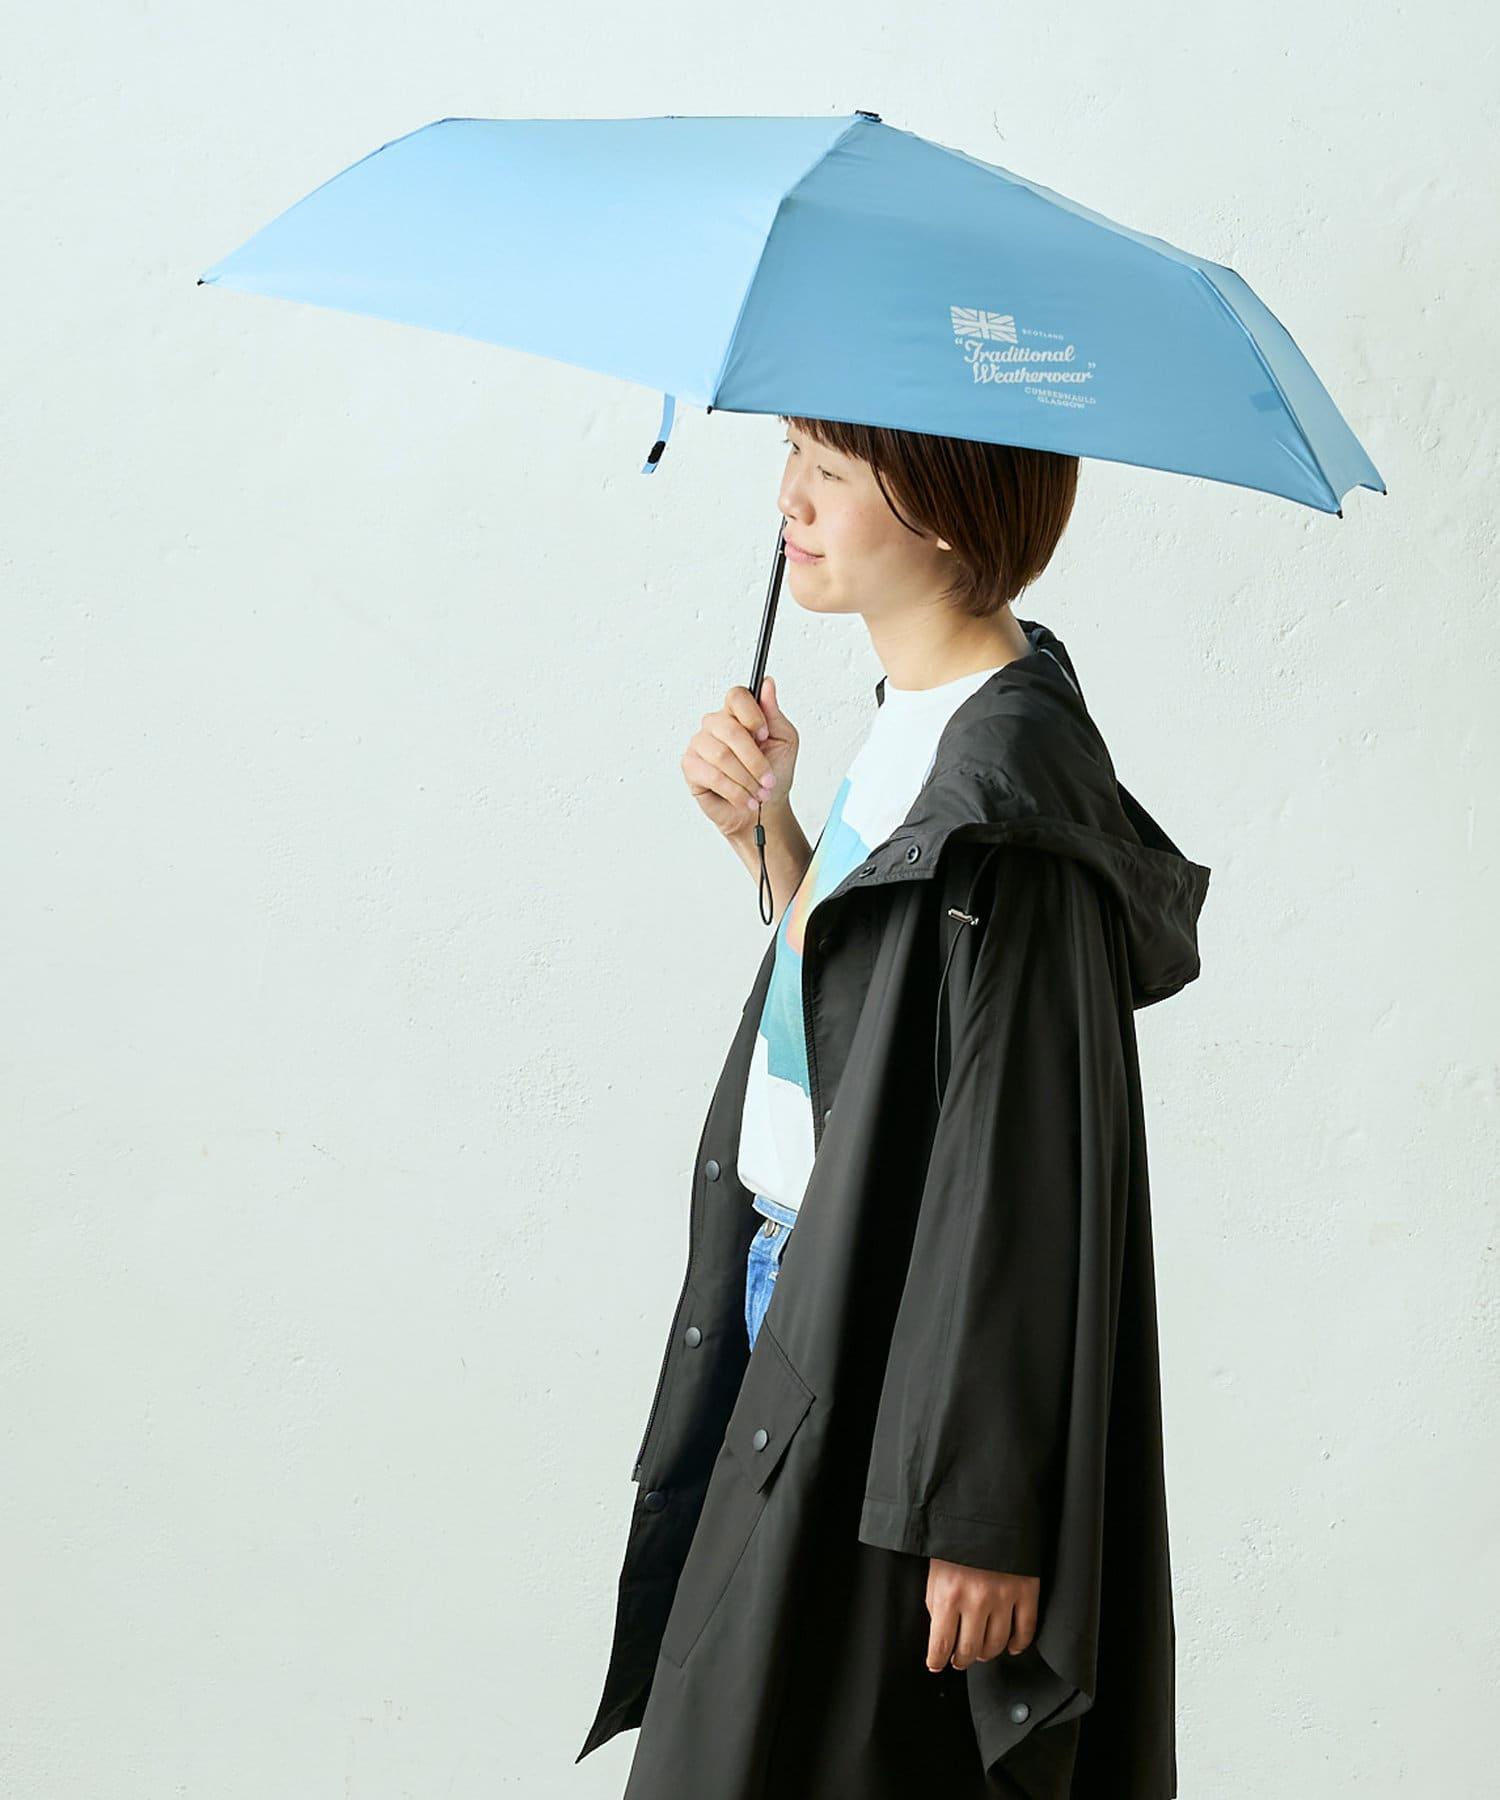 LIVETART(リヴェタート) 《Traditional Weatherwear》折り畳み傘 【WEB限定】